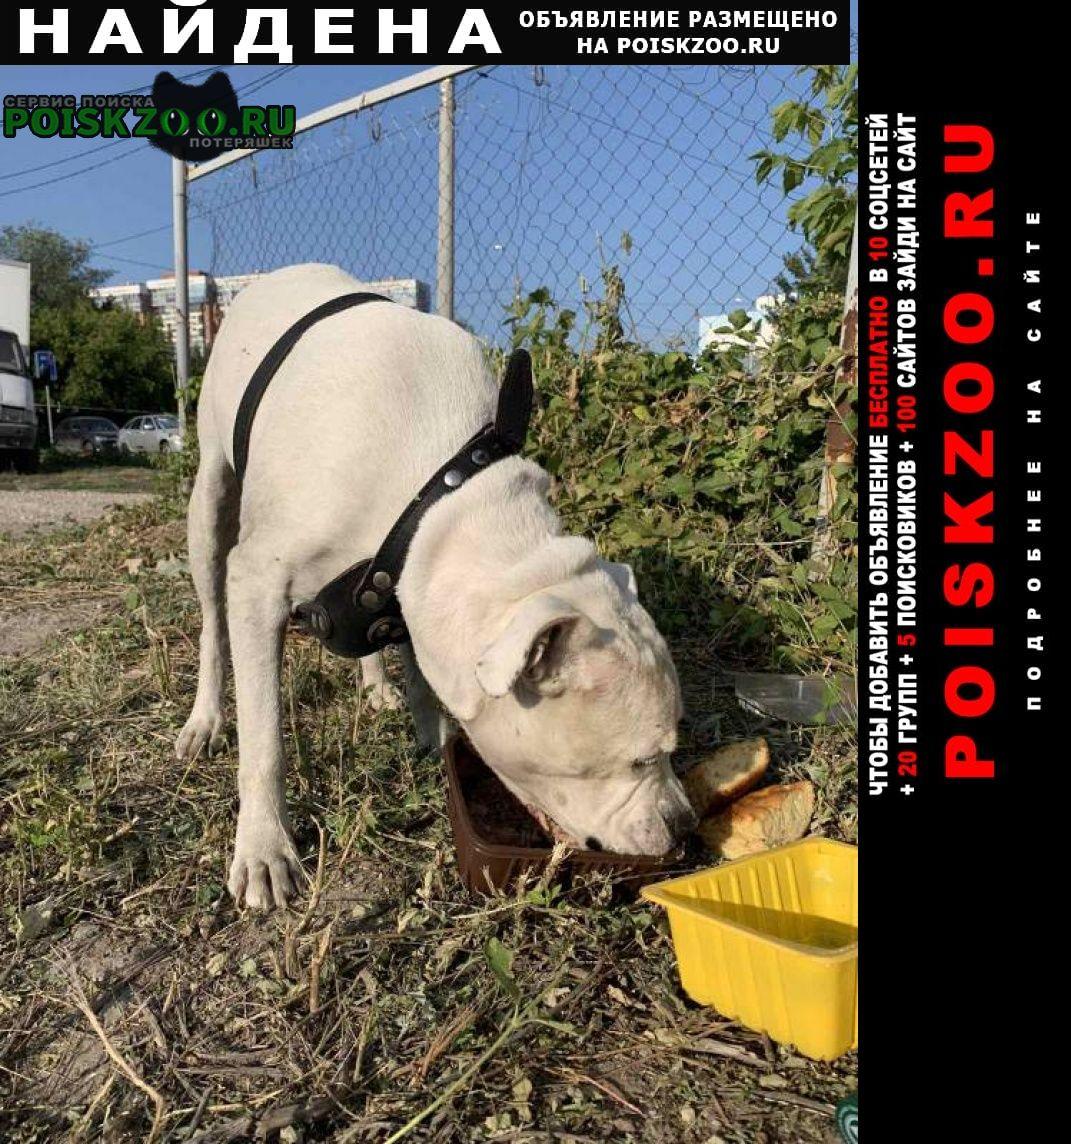 Найдена собака кобель бульдог белого цвета Самара